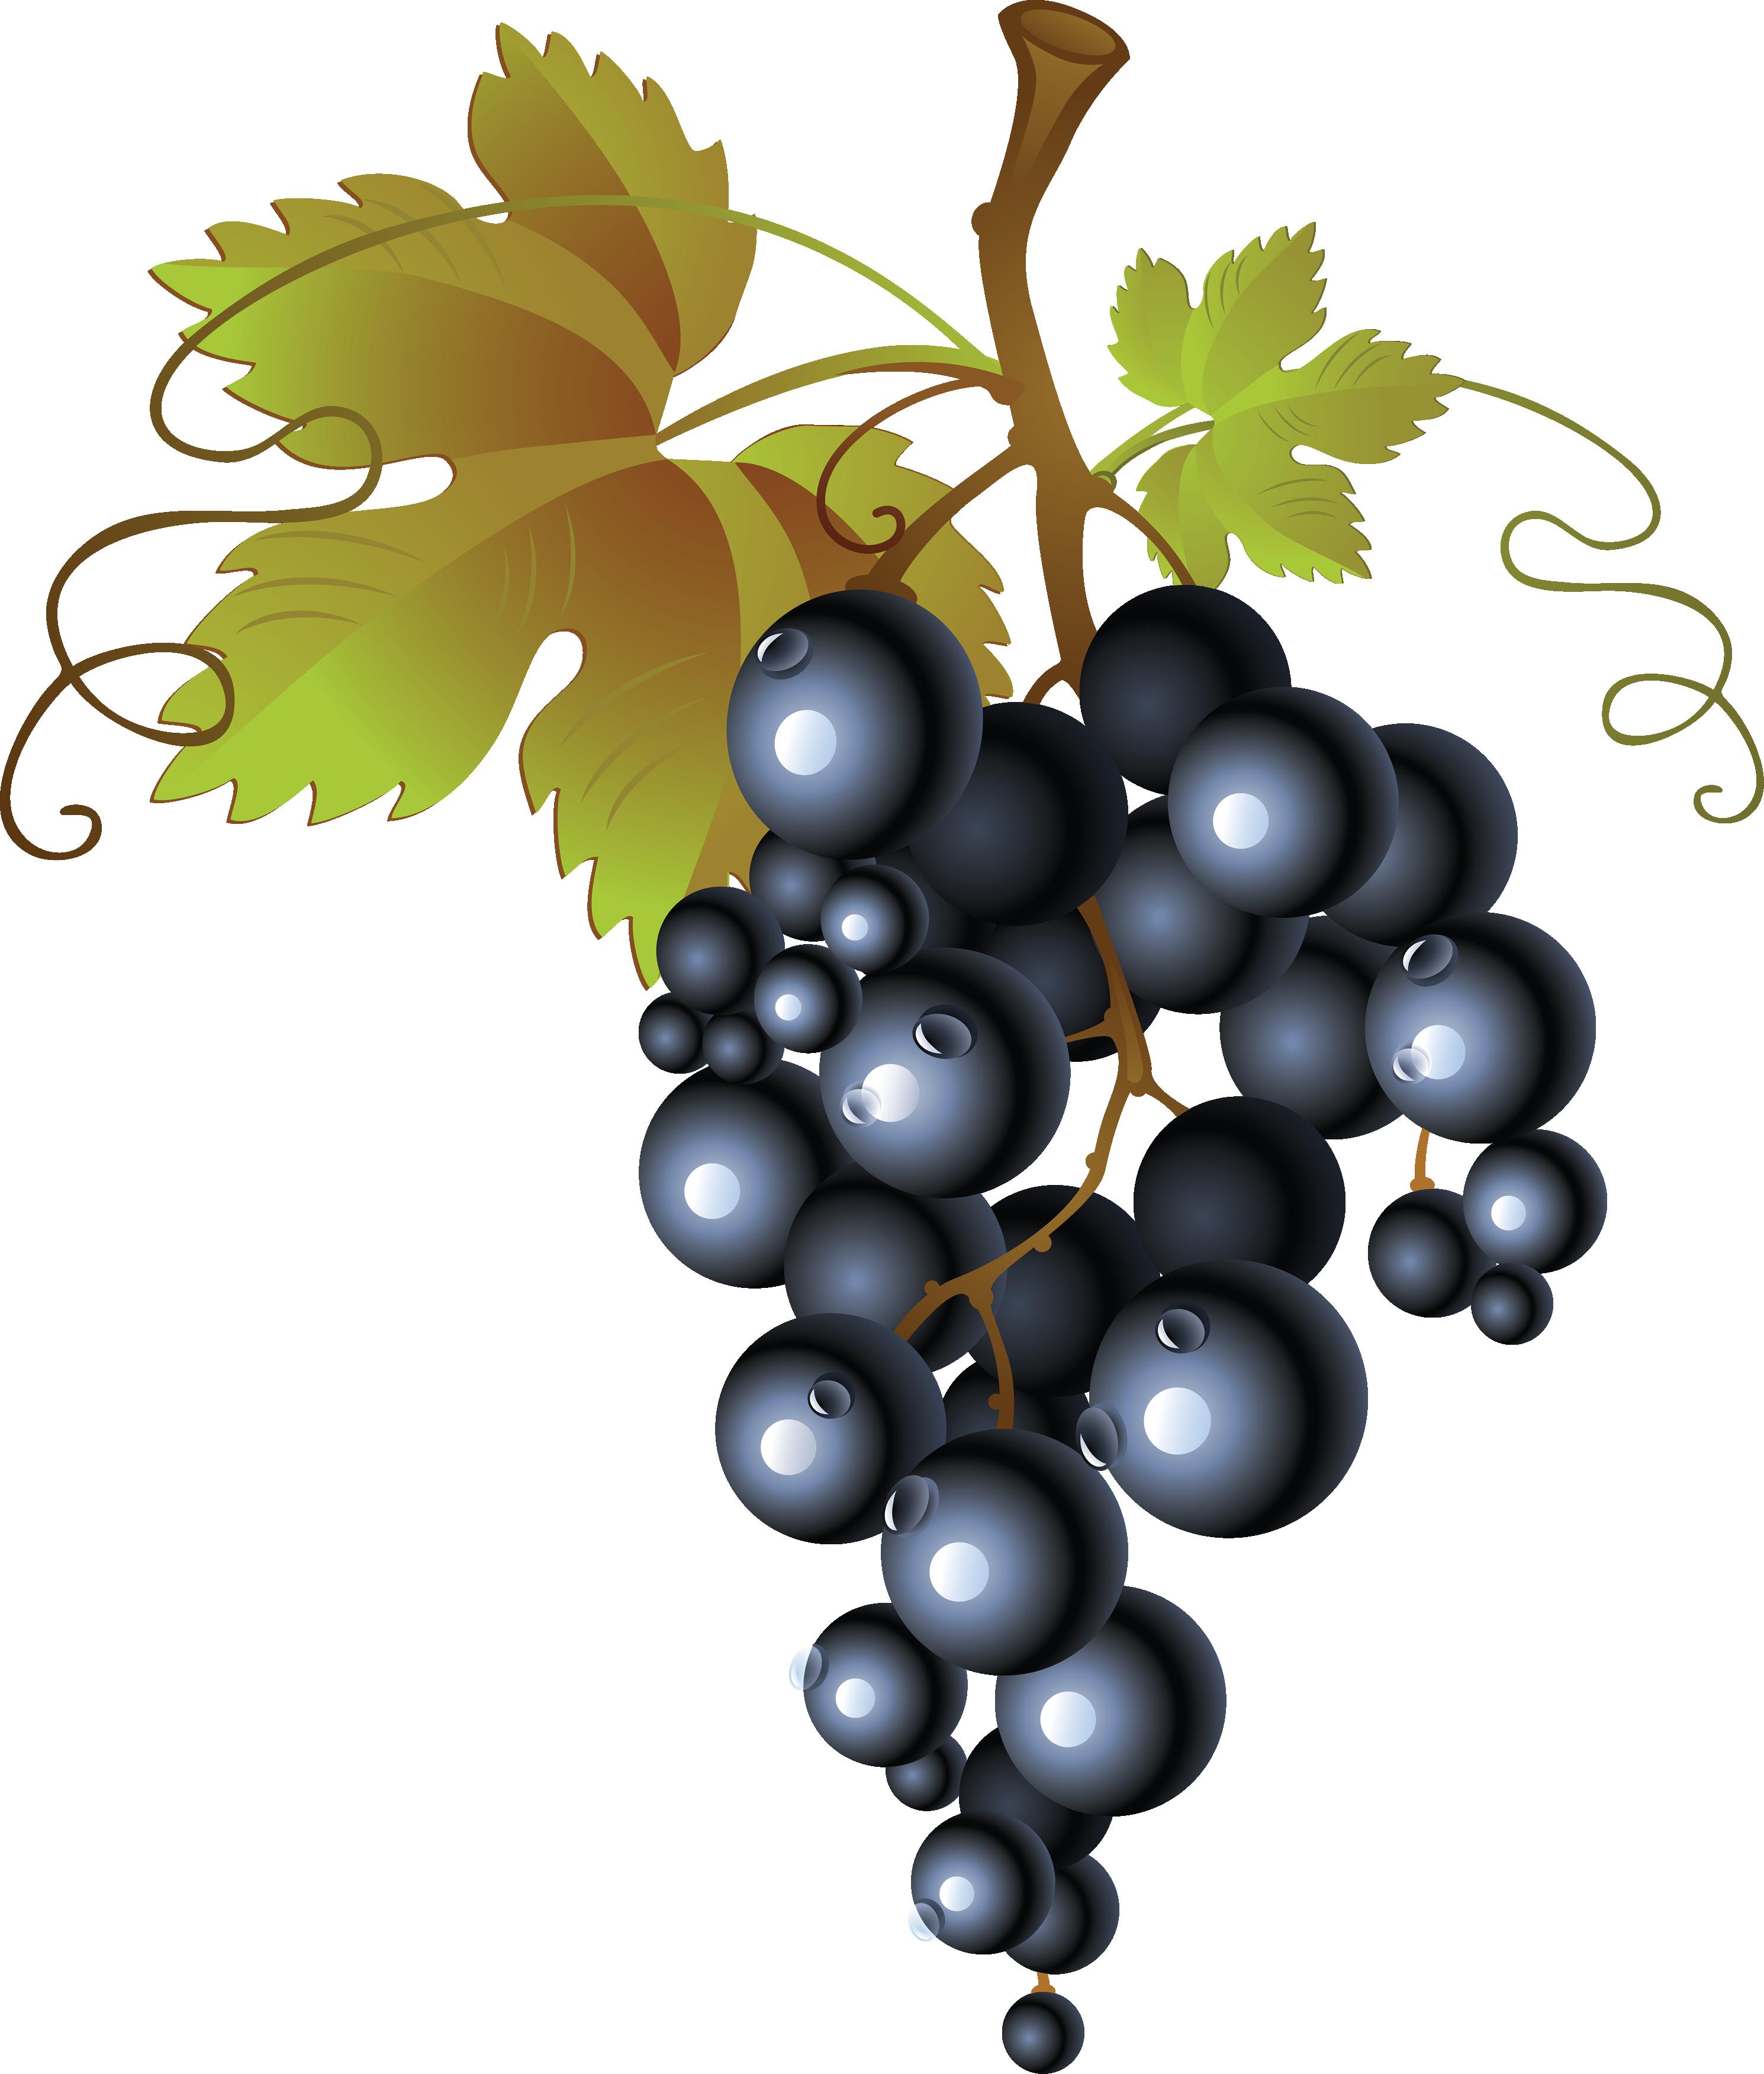 0 11e122 3b0e5b72 orig 2980 3504 winogrona transparent pinterest grappe de raisin. Black Bedroom Furniture Sets. Home Design Ideas